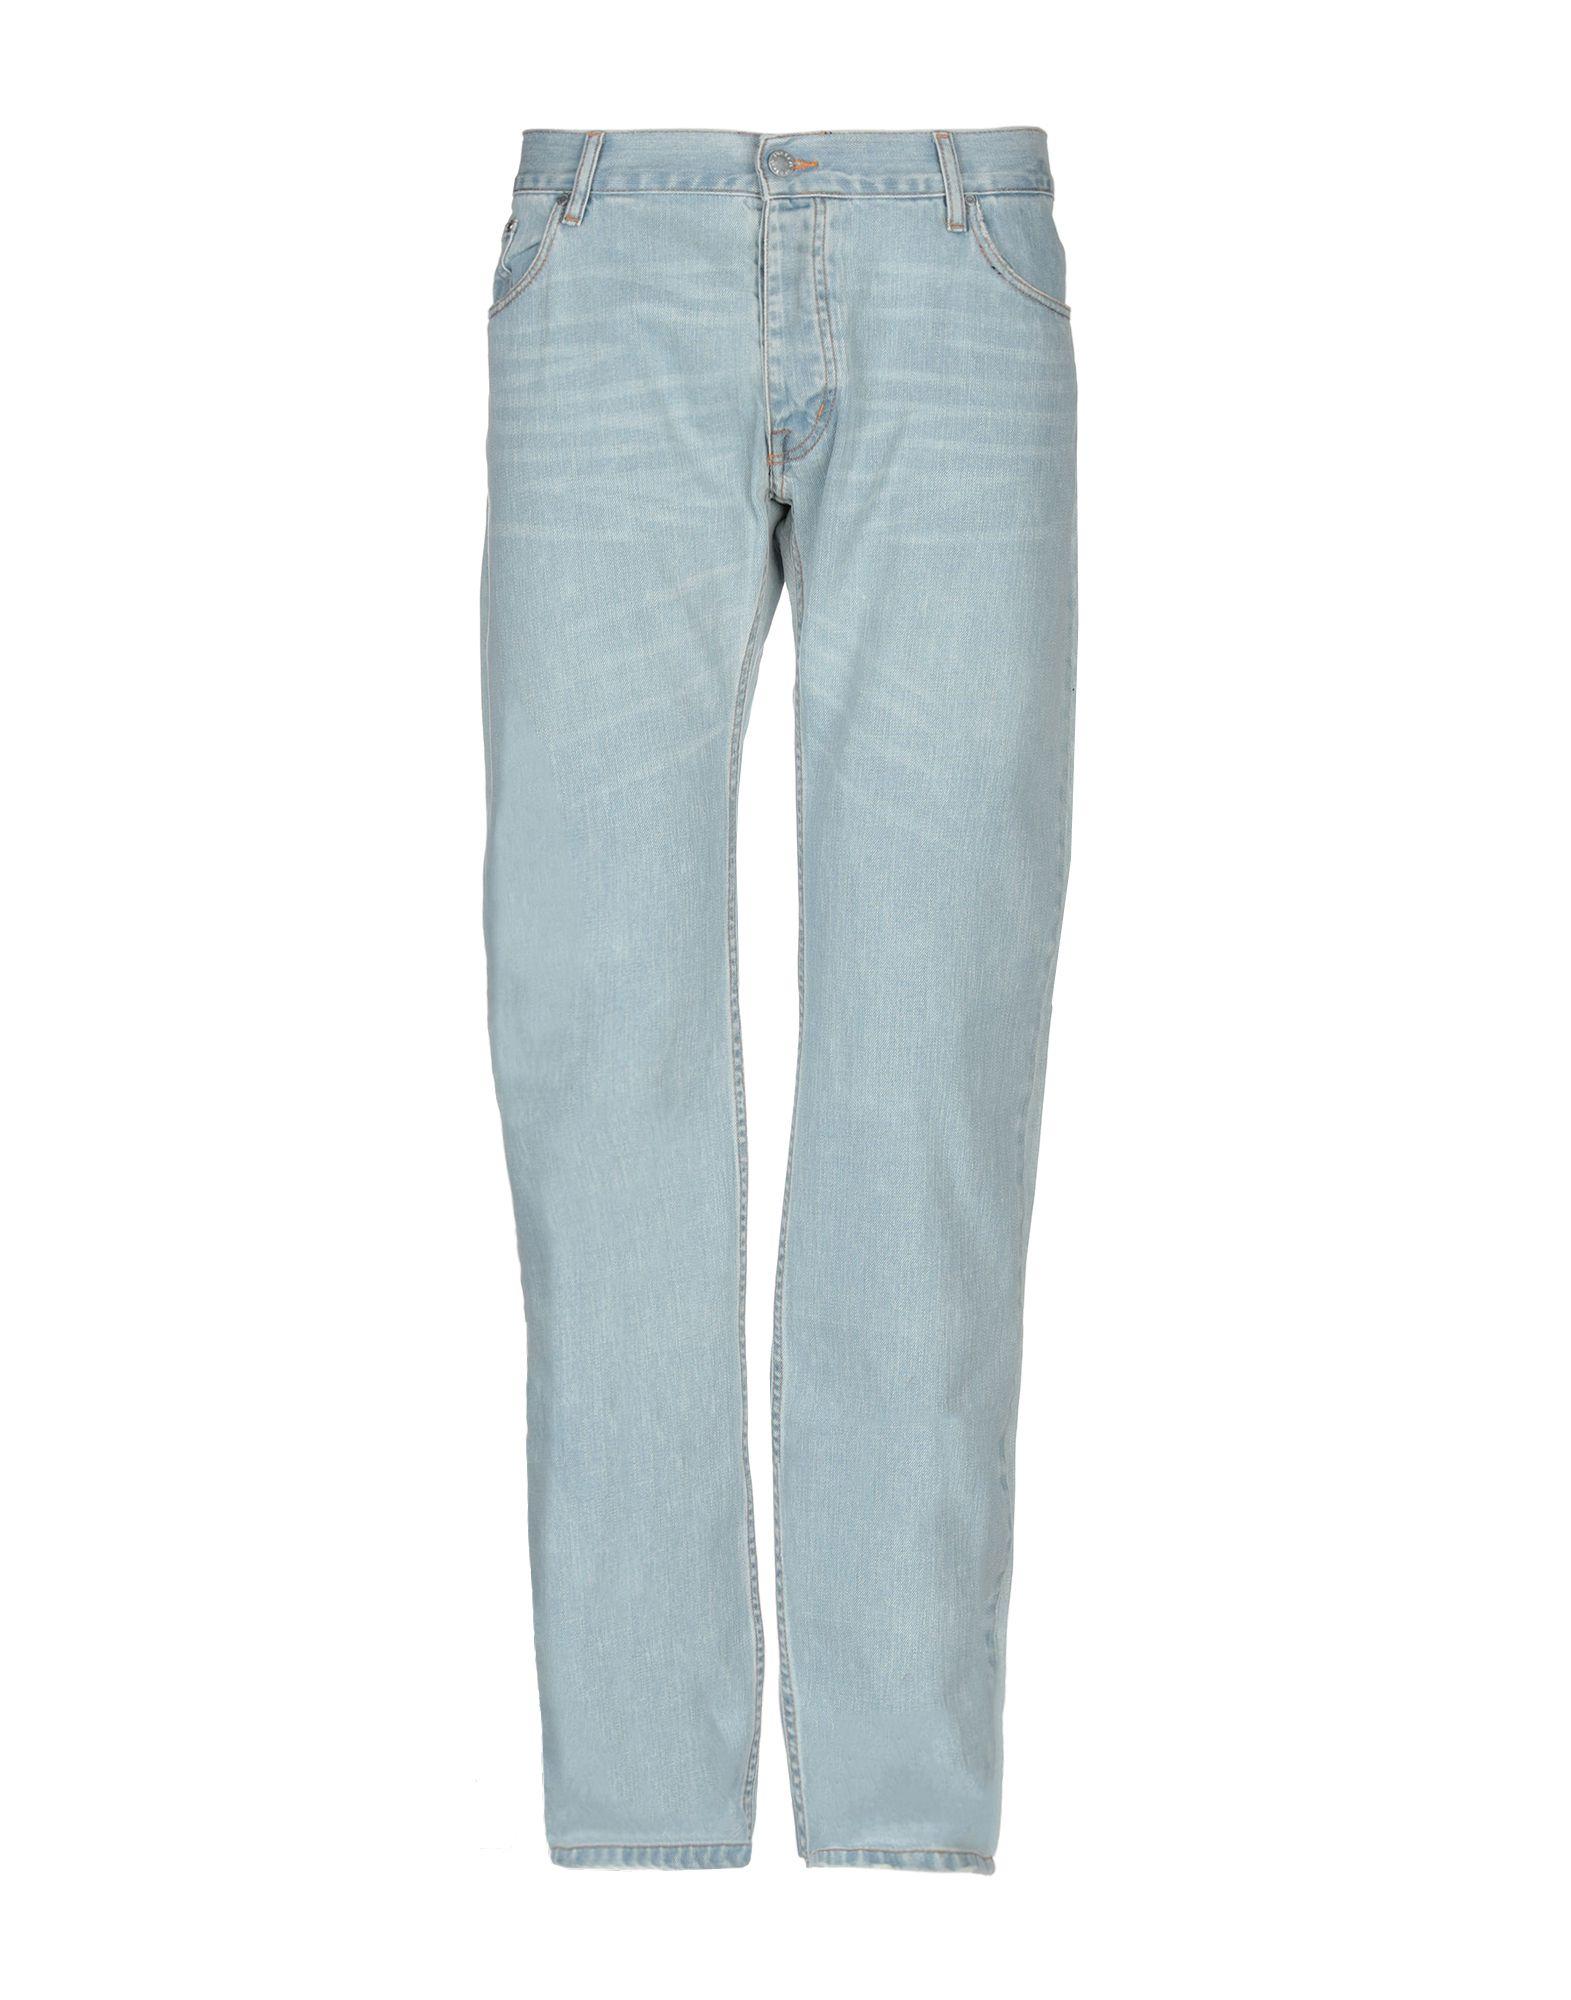 GF FERRE' JEANS Джинсовые брюки цена 2017